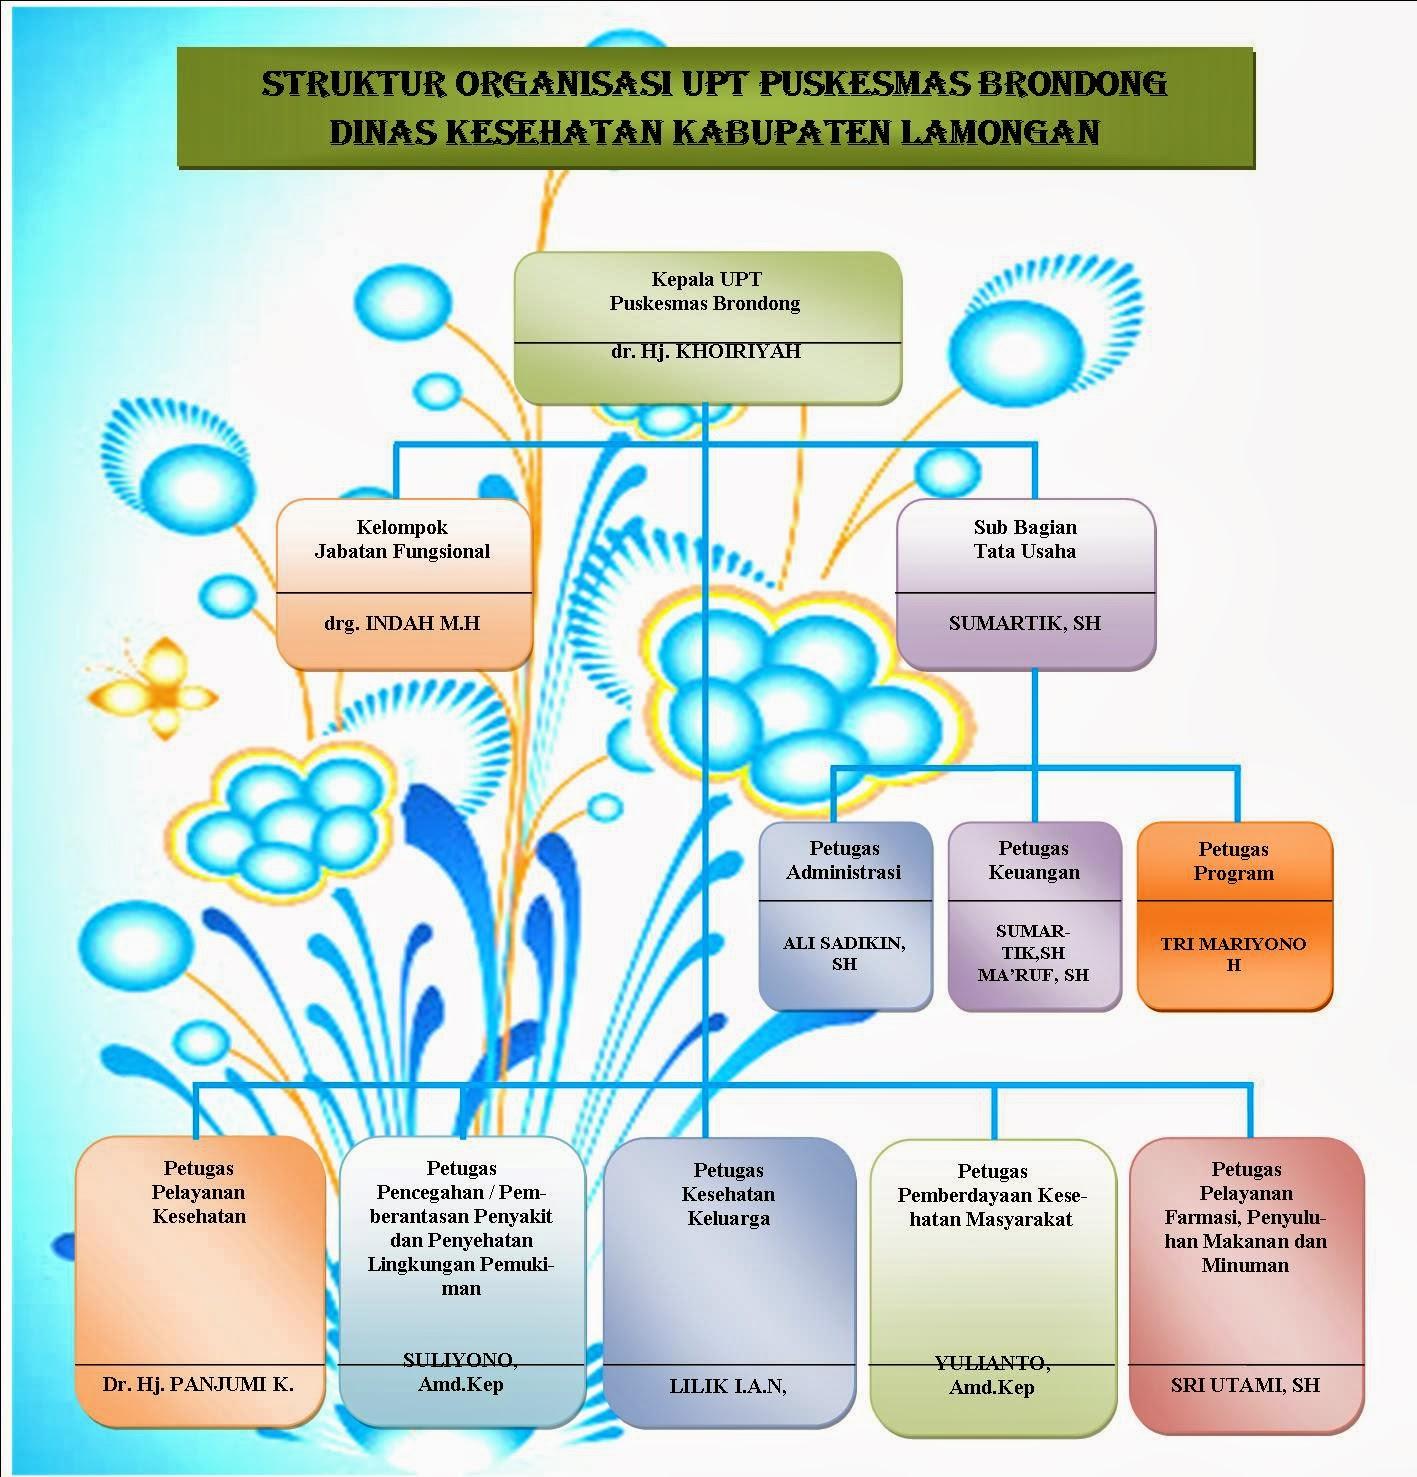 Puskesmas Brondong Lamongan Struktur Organisasi